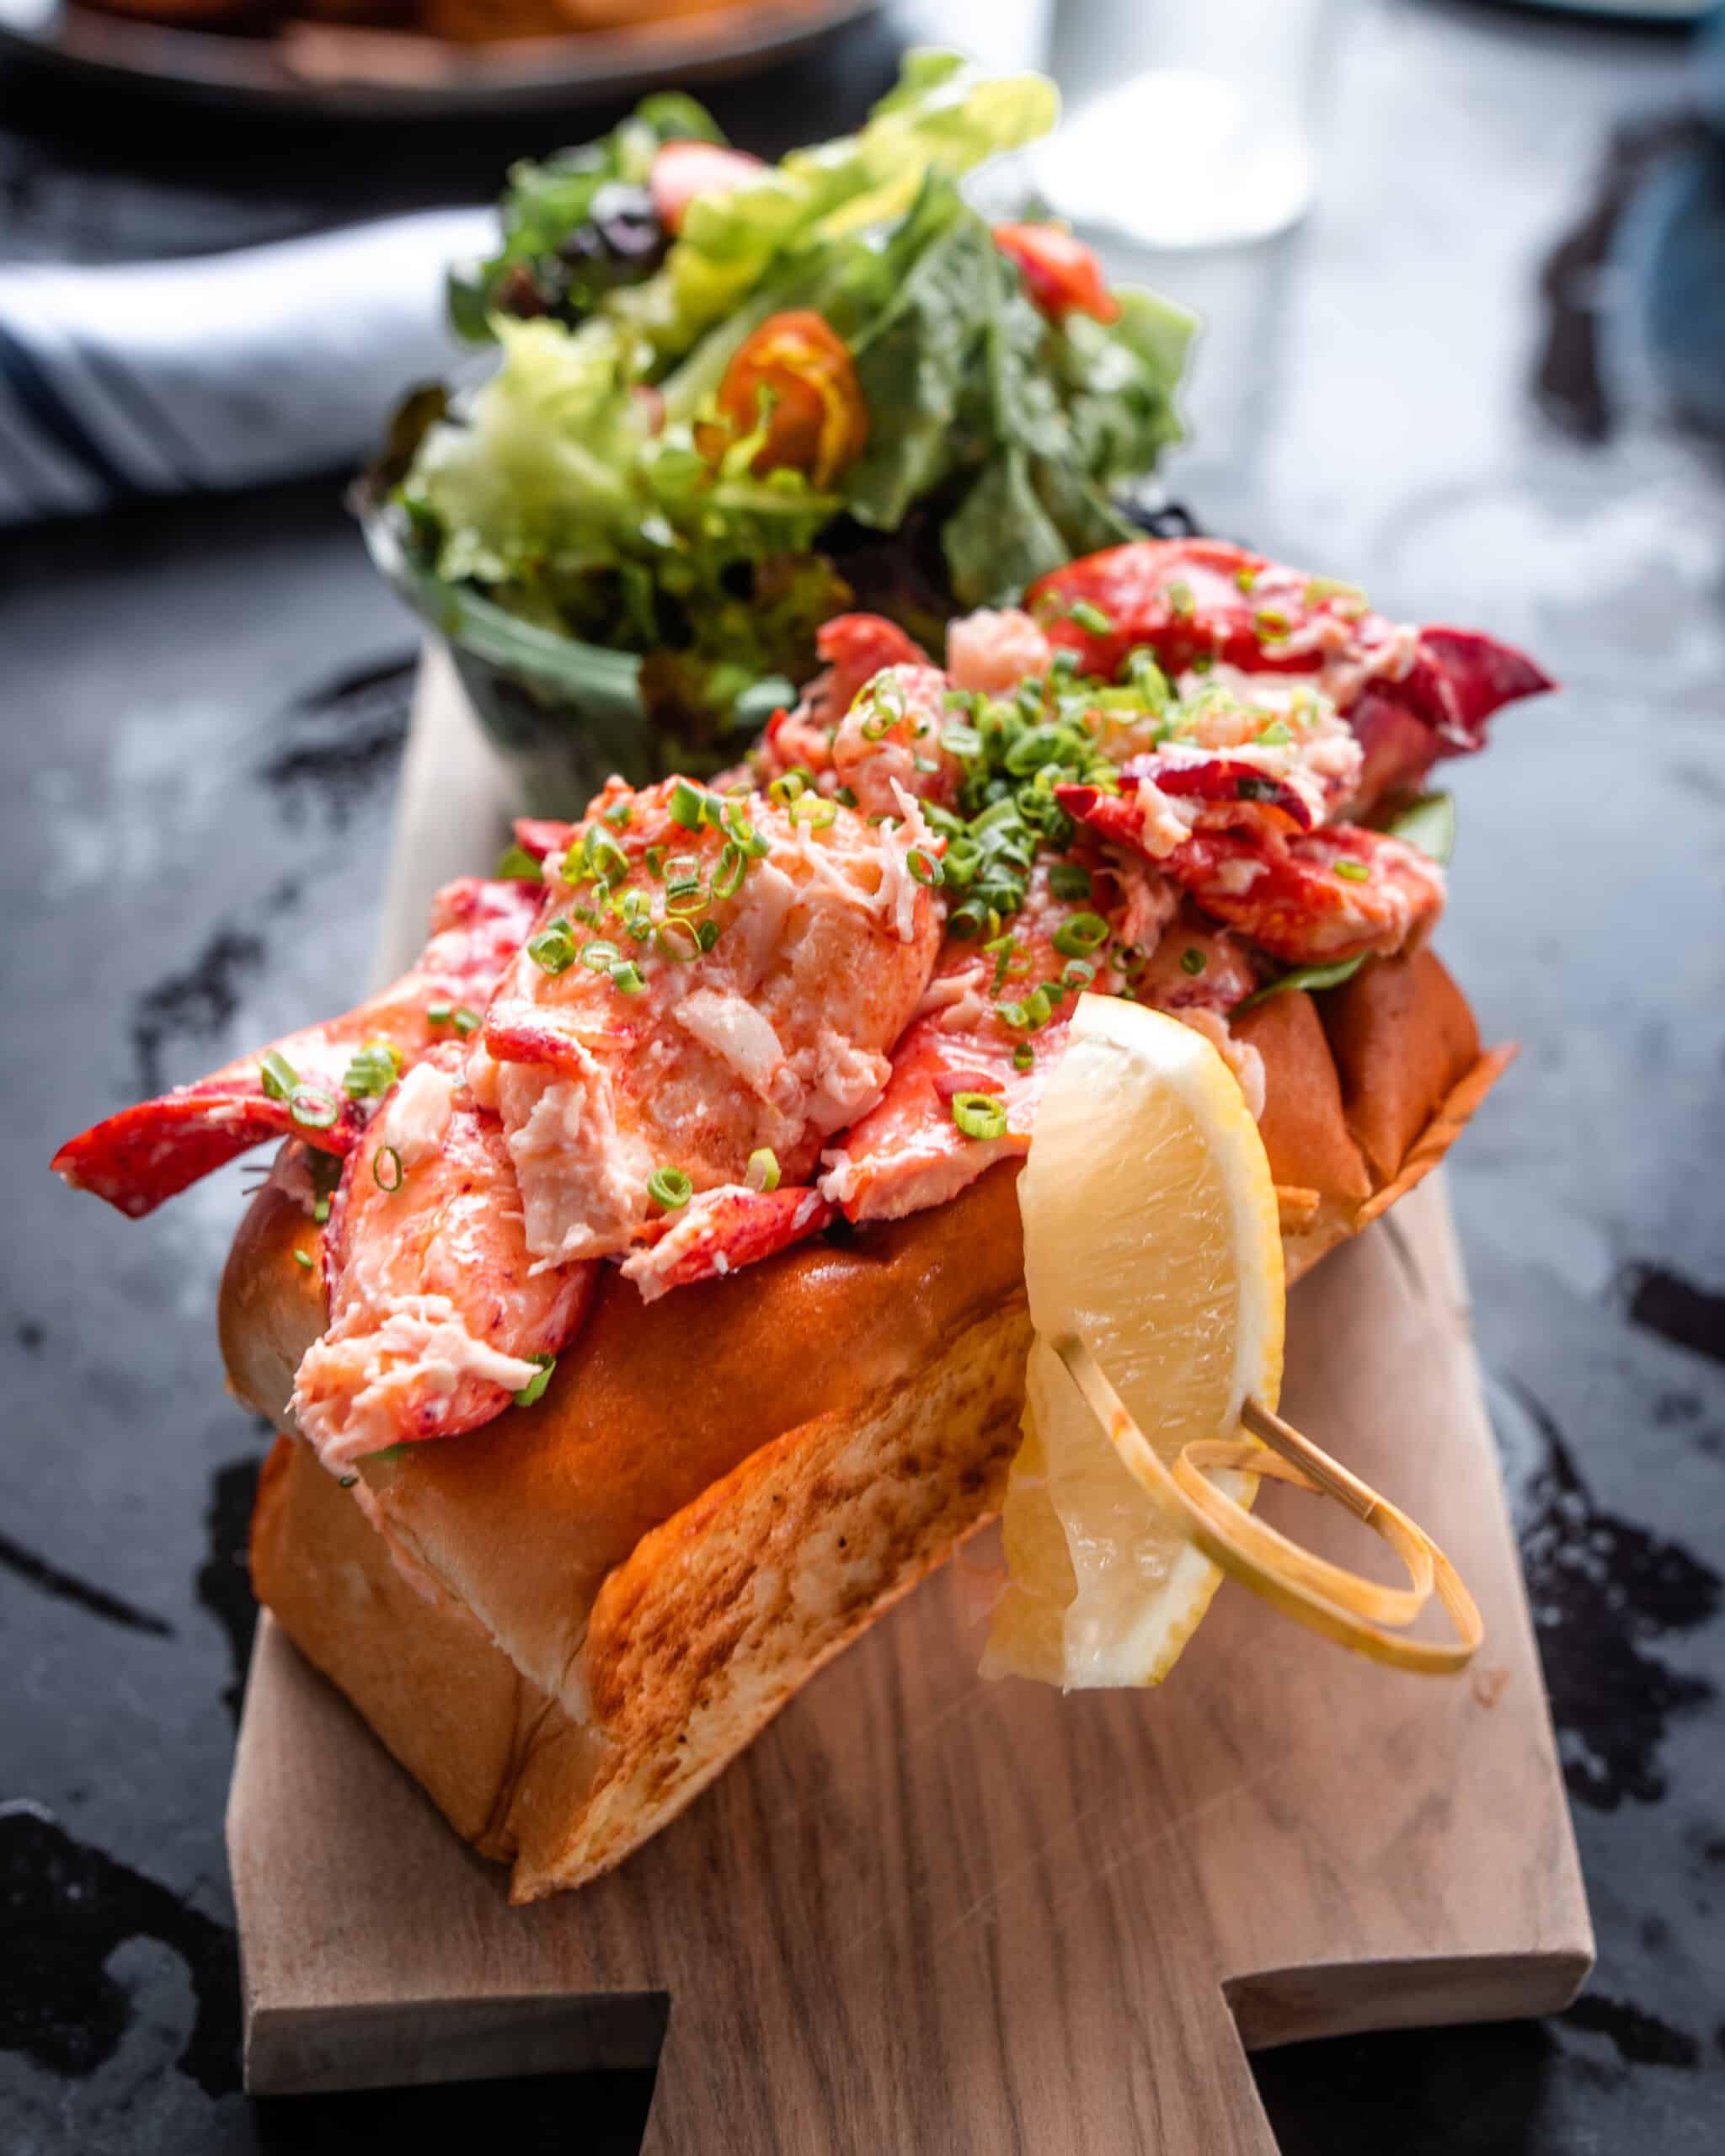 Chatham Bars Inn Lobster Roll